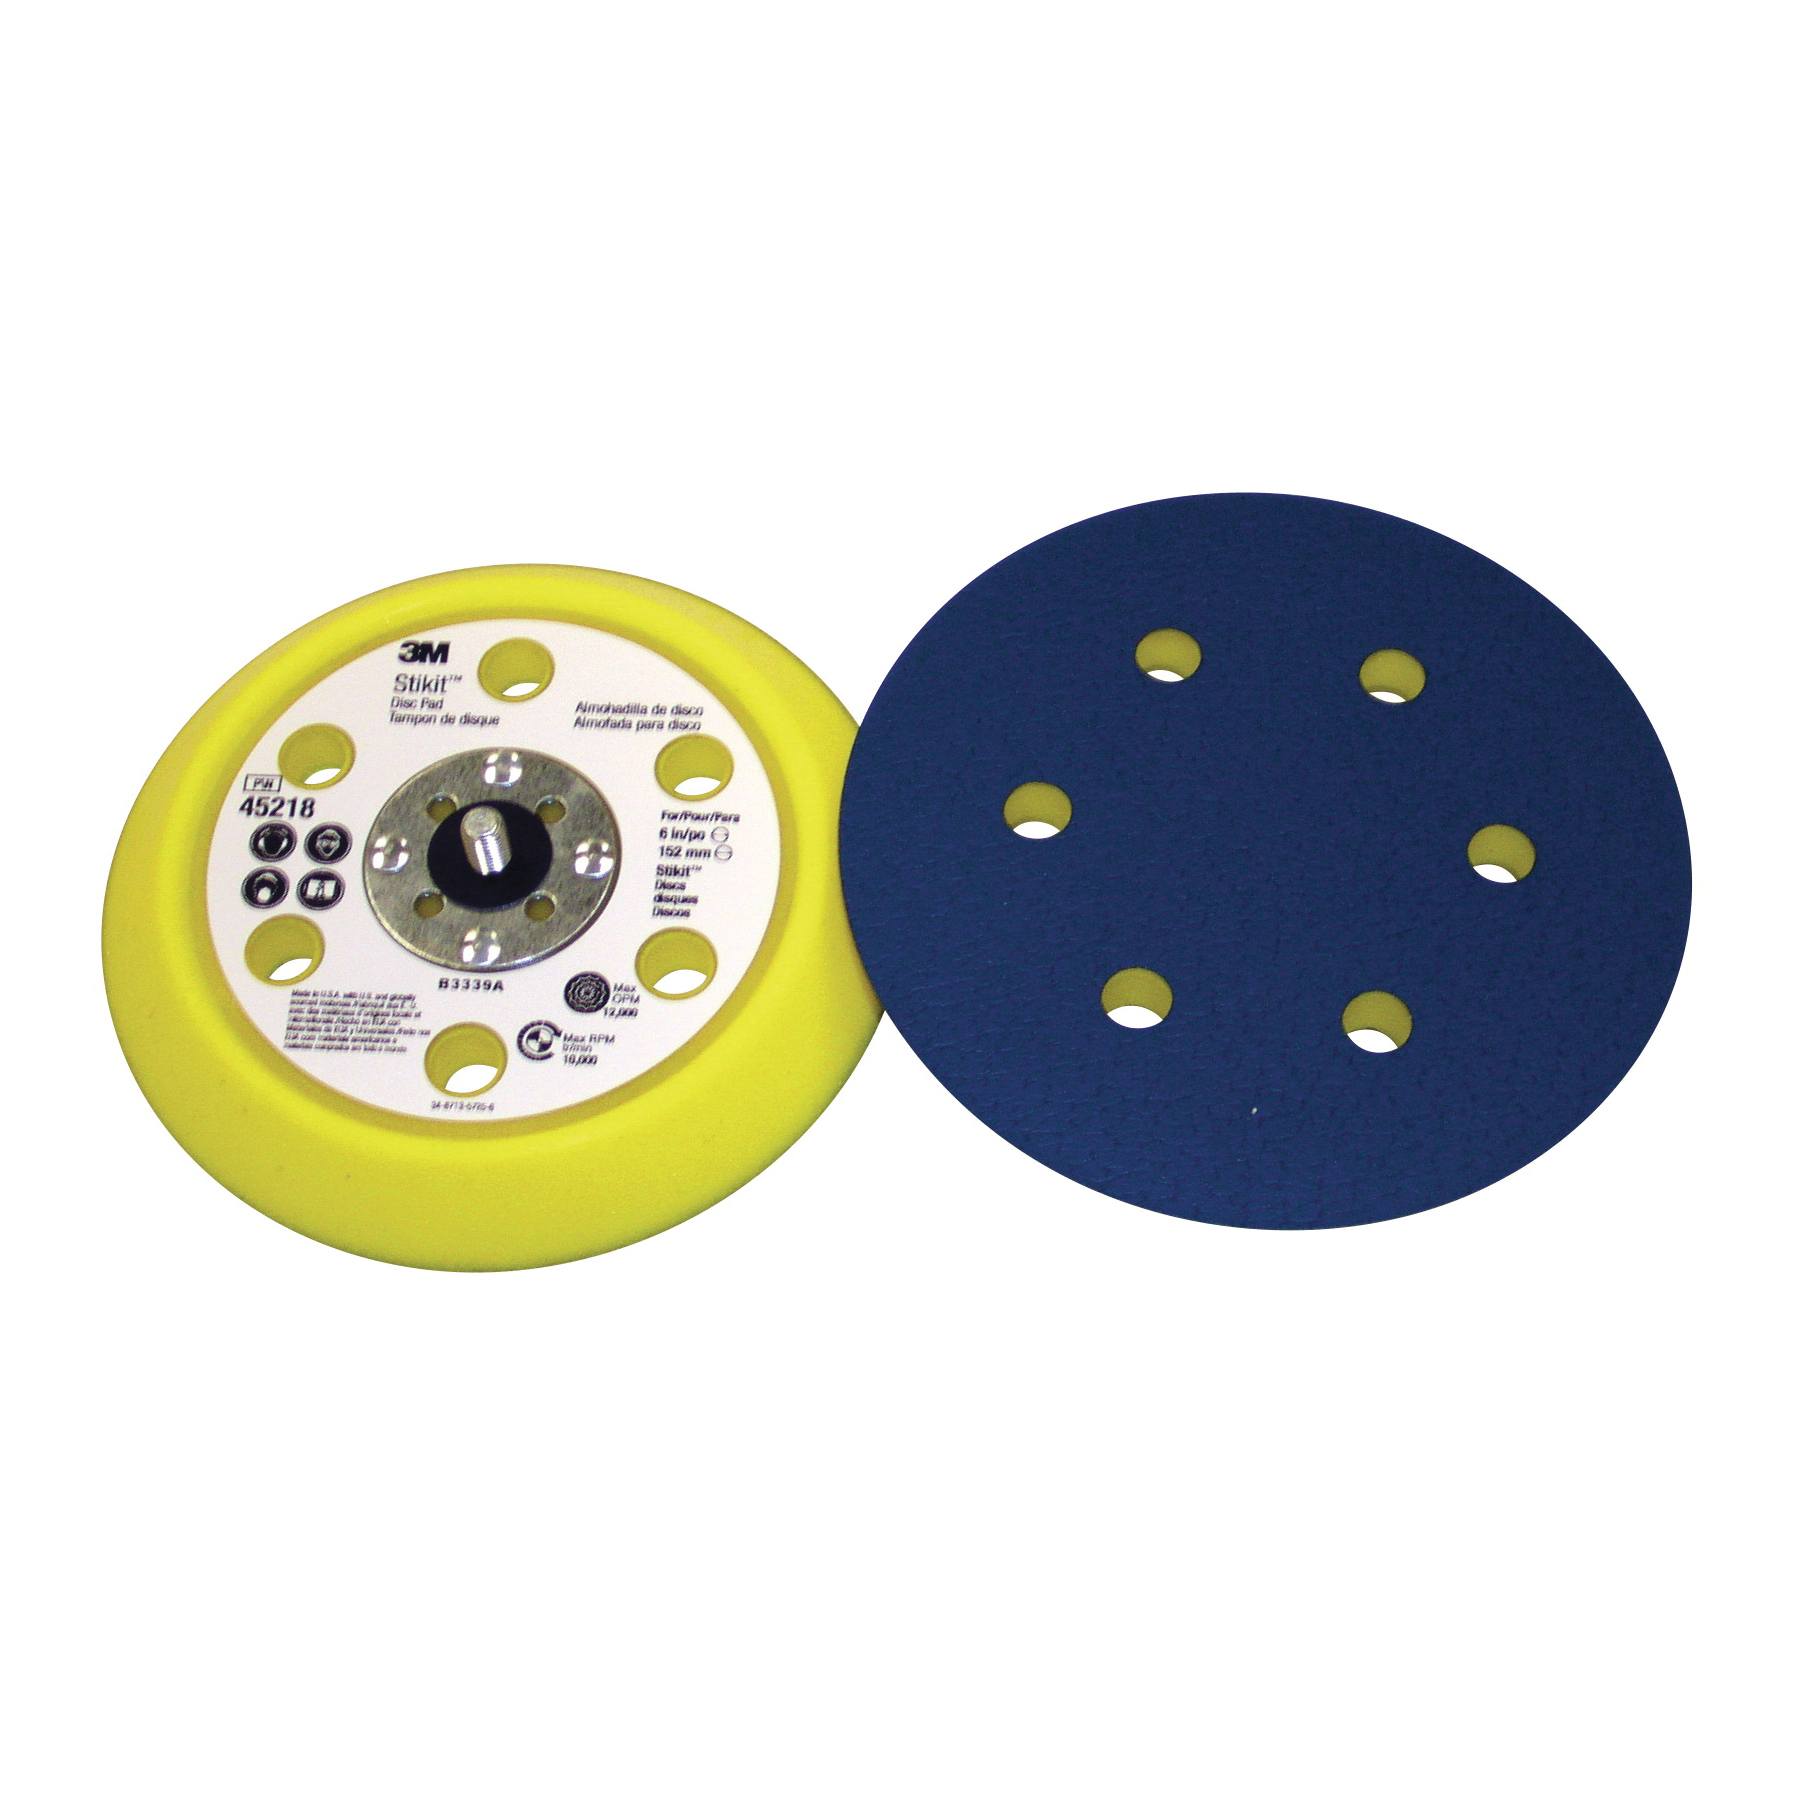 3M™ Stikit™ 051144-45218 Adhesive Back Dust Control Medium Density Disc Pad, 6 in Dia Pad, 3M™ Stikit™ Attachment